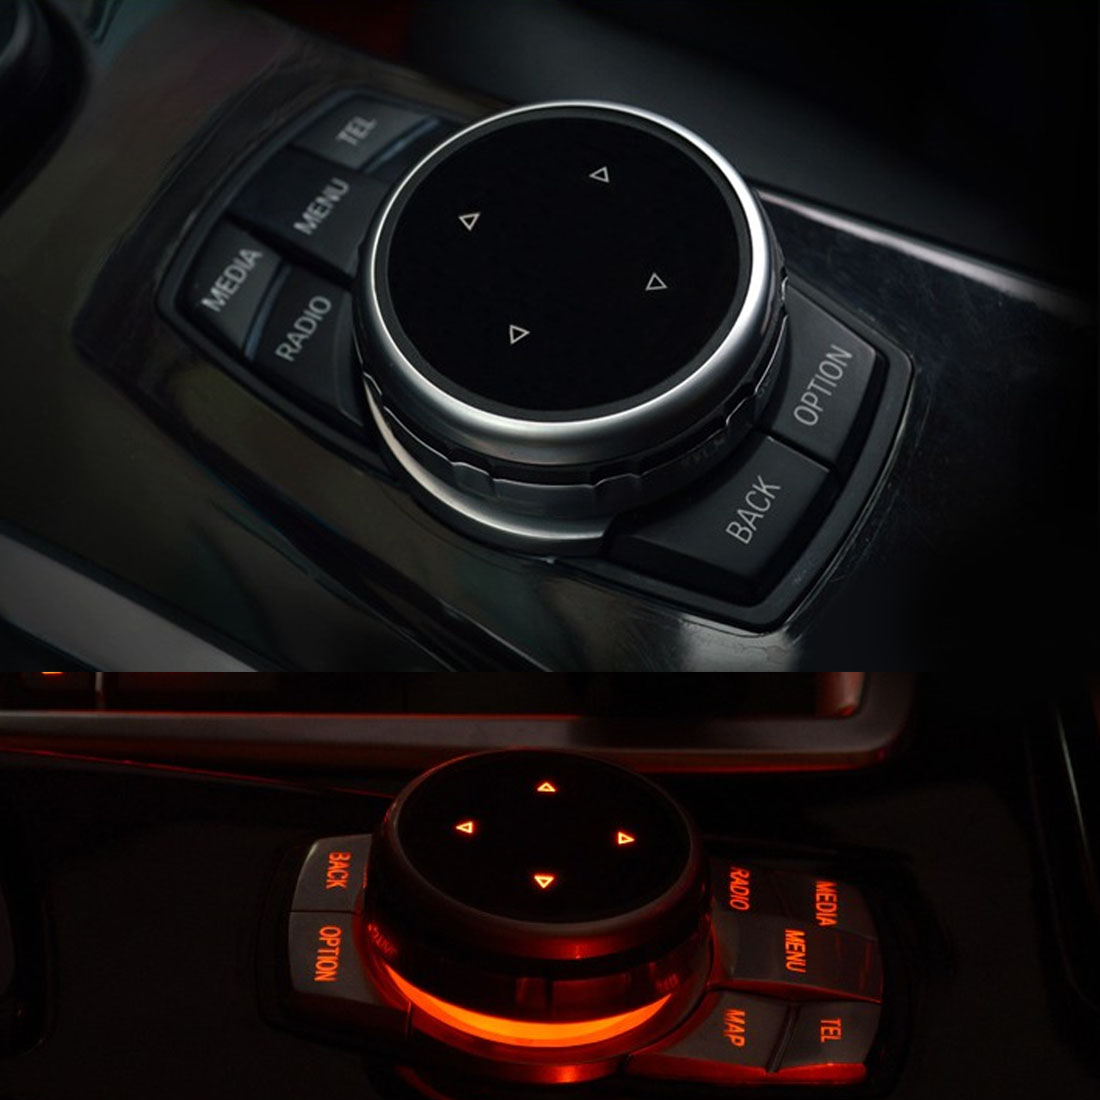 Dewtreetali iDrive Car Multimedia Buttons Cover M Emblem Stickers for BMW X1 X3 X5 X6 F30 E90 F10 F18 F11 F15 F16 F25 E60 E61 bigbigroad for bmw x1 f48 2016 x3 f25 f10 f30 f36 x5 f15 car wifi dvr video recorder novatek 96655 black box dash cam camera